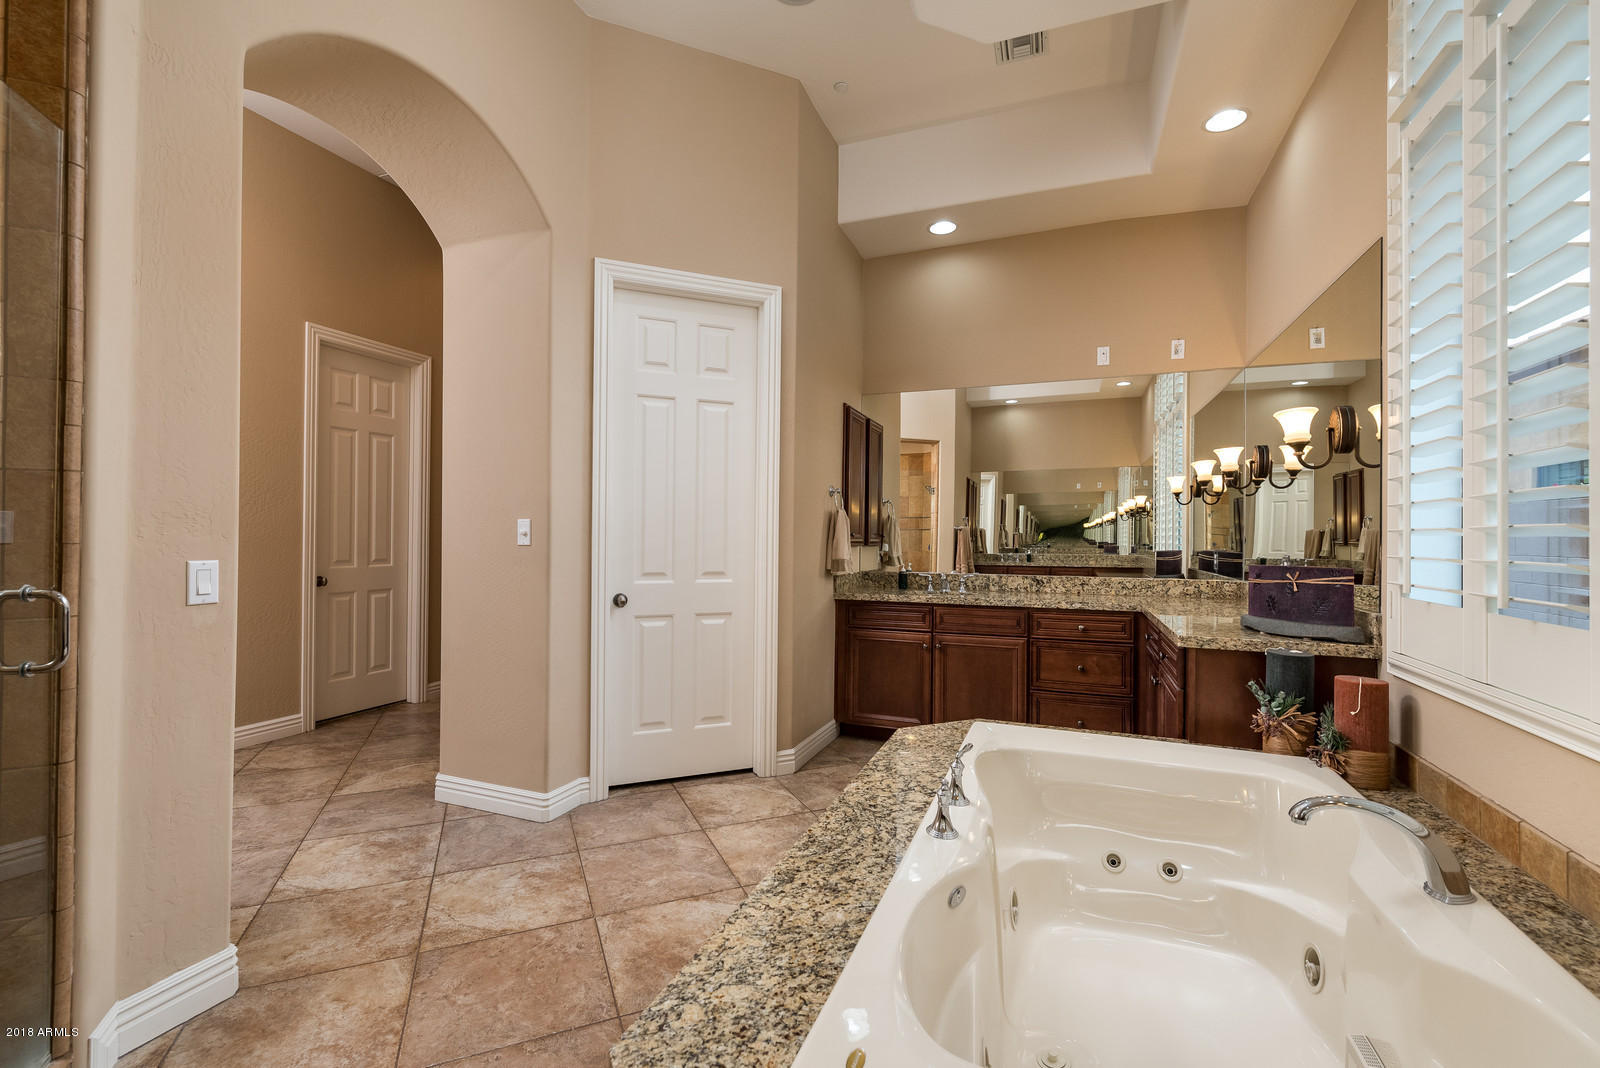 MLS 5857292 9995 E RIDGERUNNER Drive, Scottsdale, AZ 85255 Scottsdale AZ Windgate Ranch